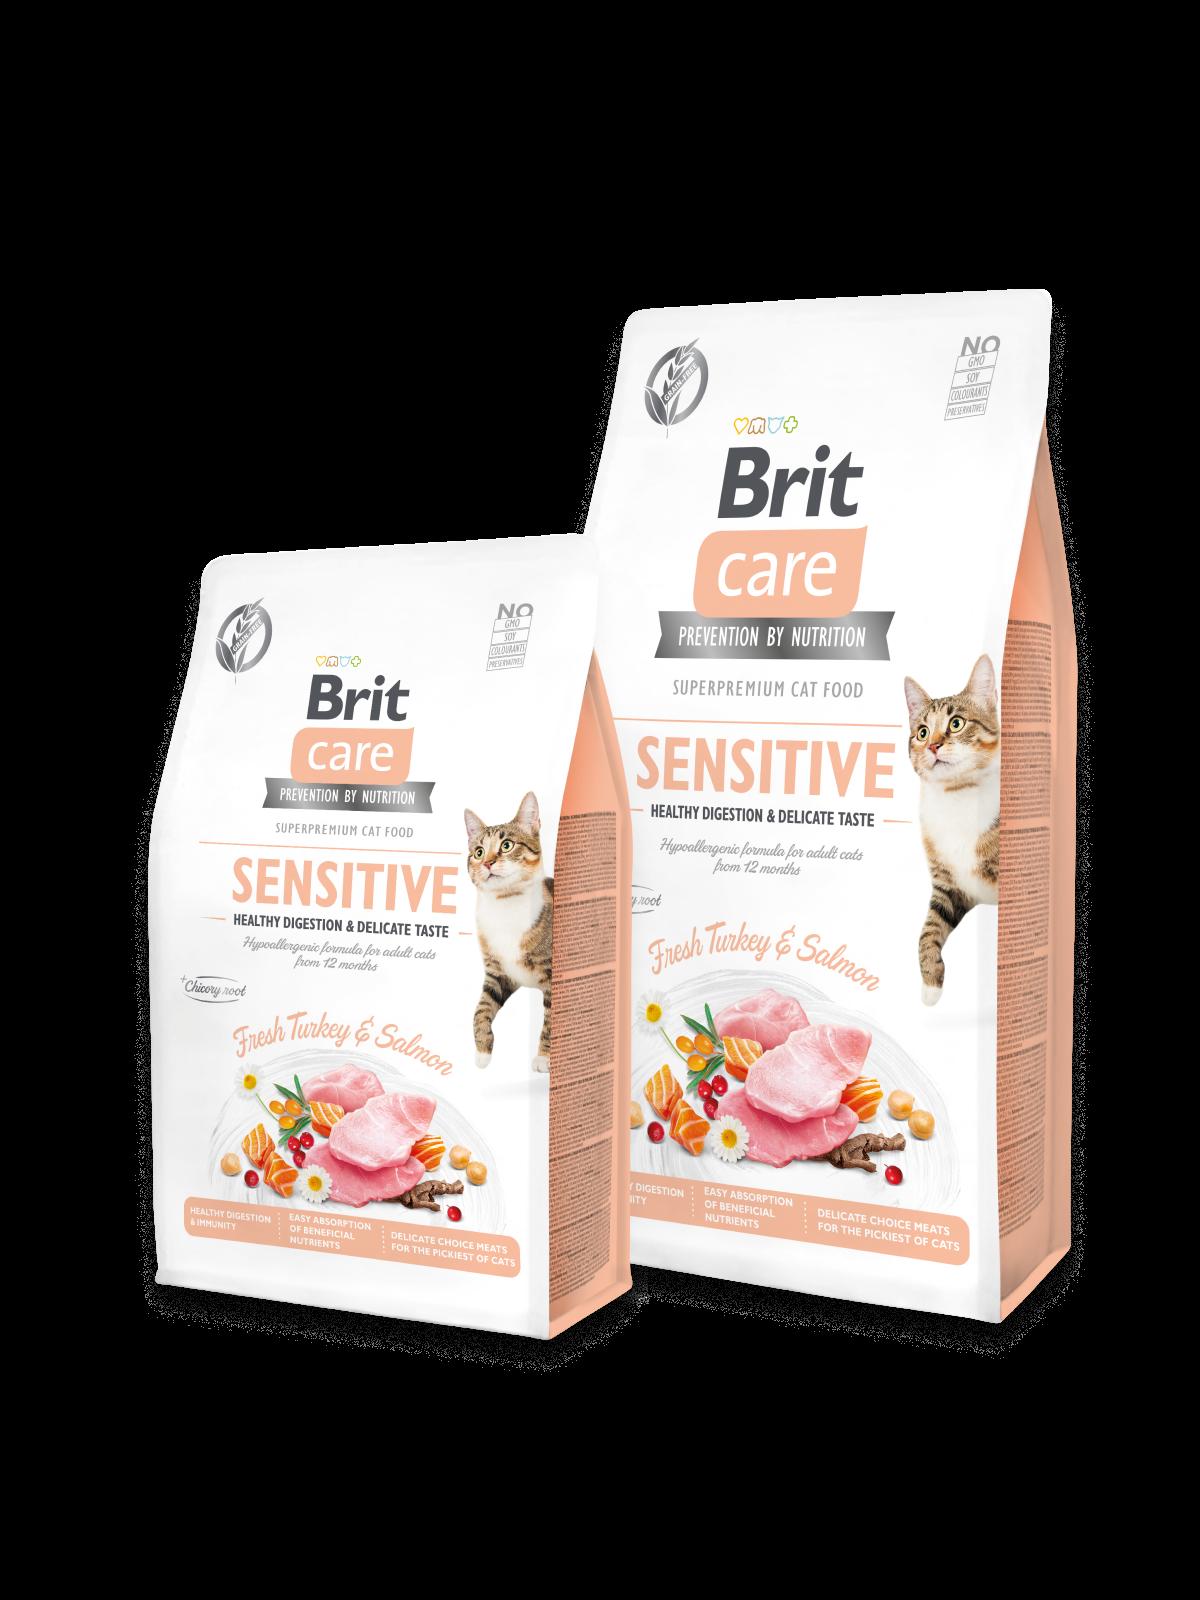 Brit Care Cat Grain-Free SENSITIVE HEALTHY DIGESTION AND DELICATE TASTE - 2 kg